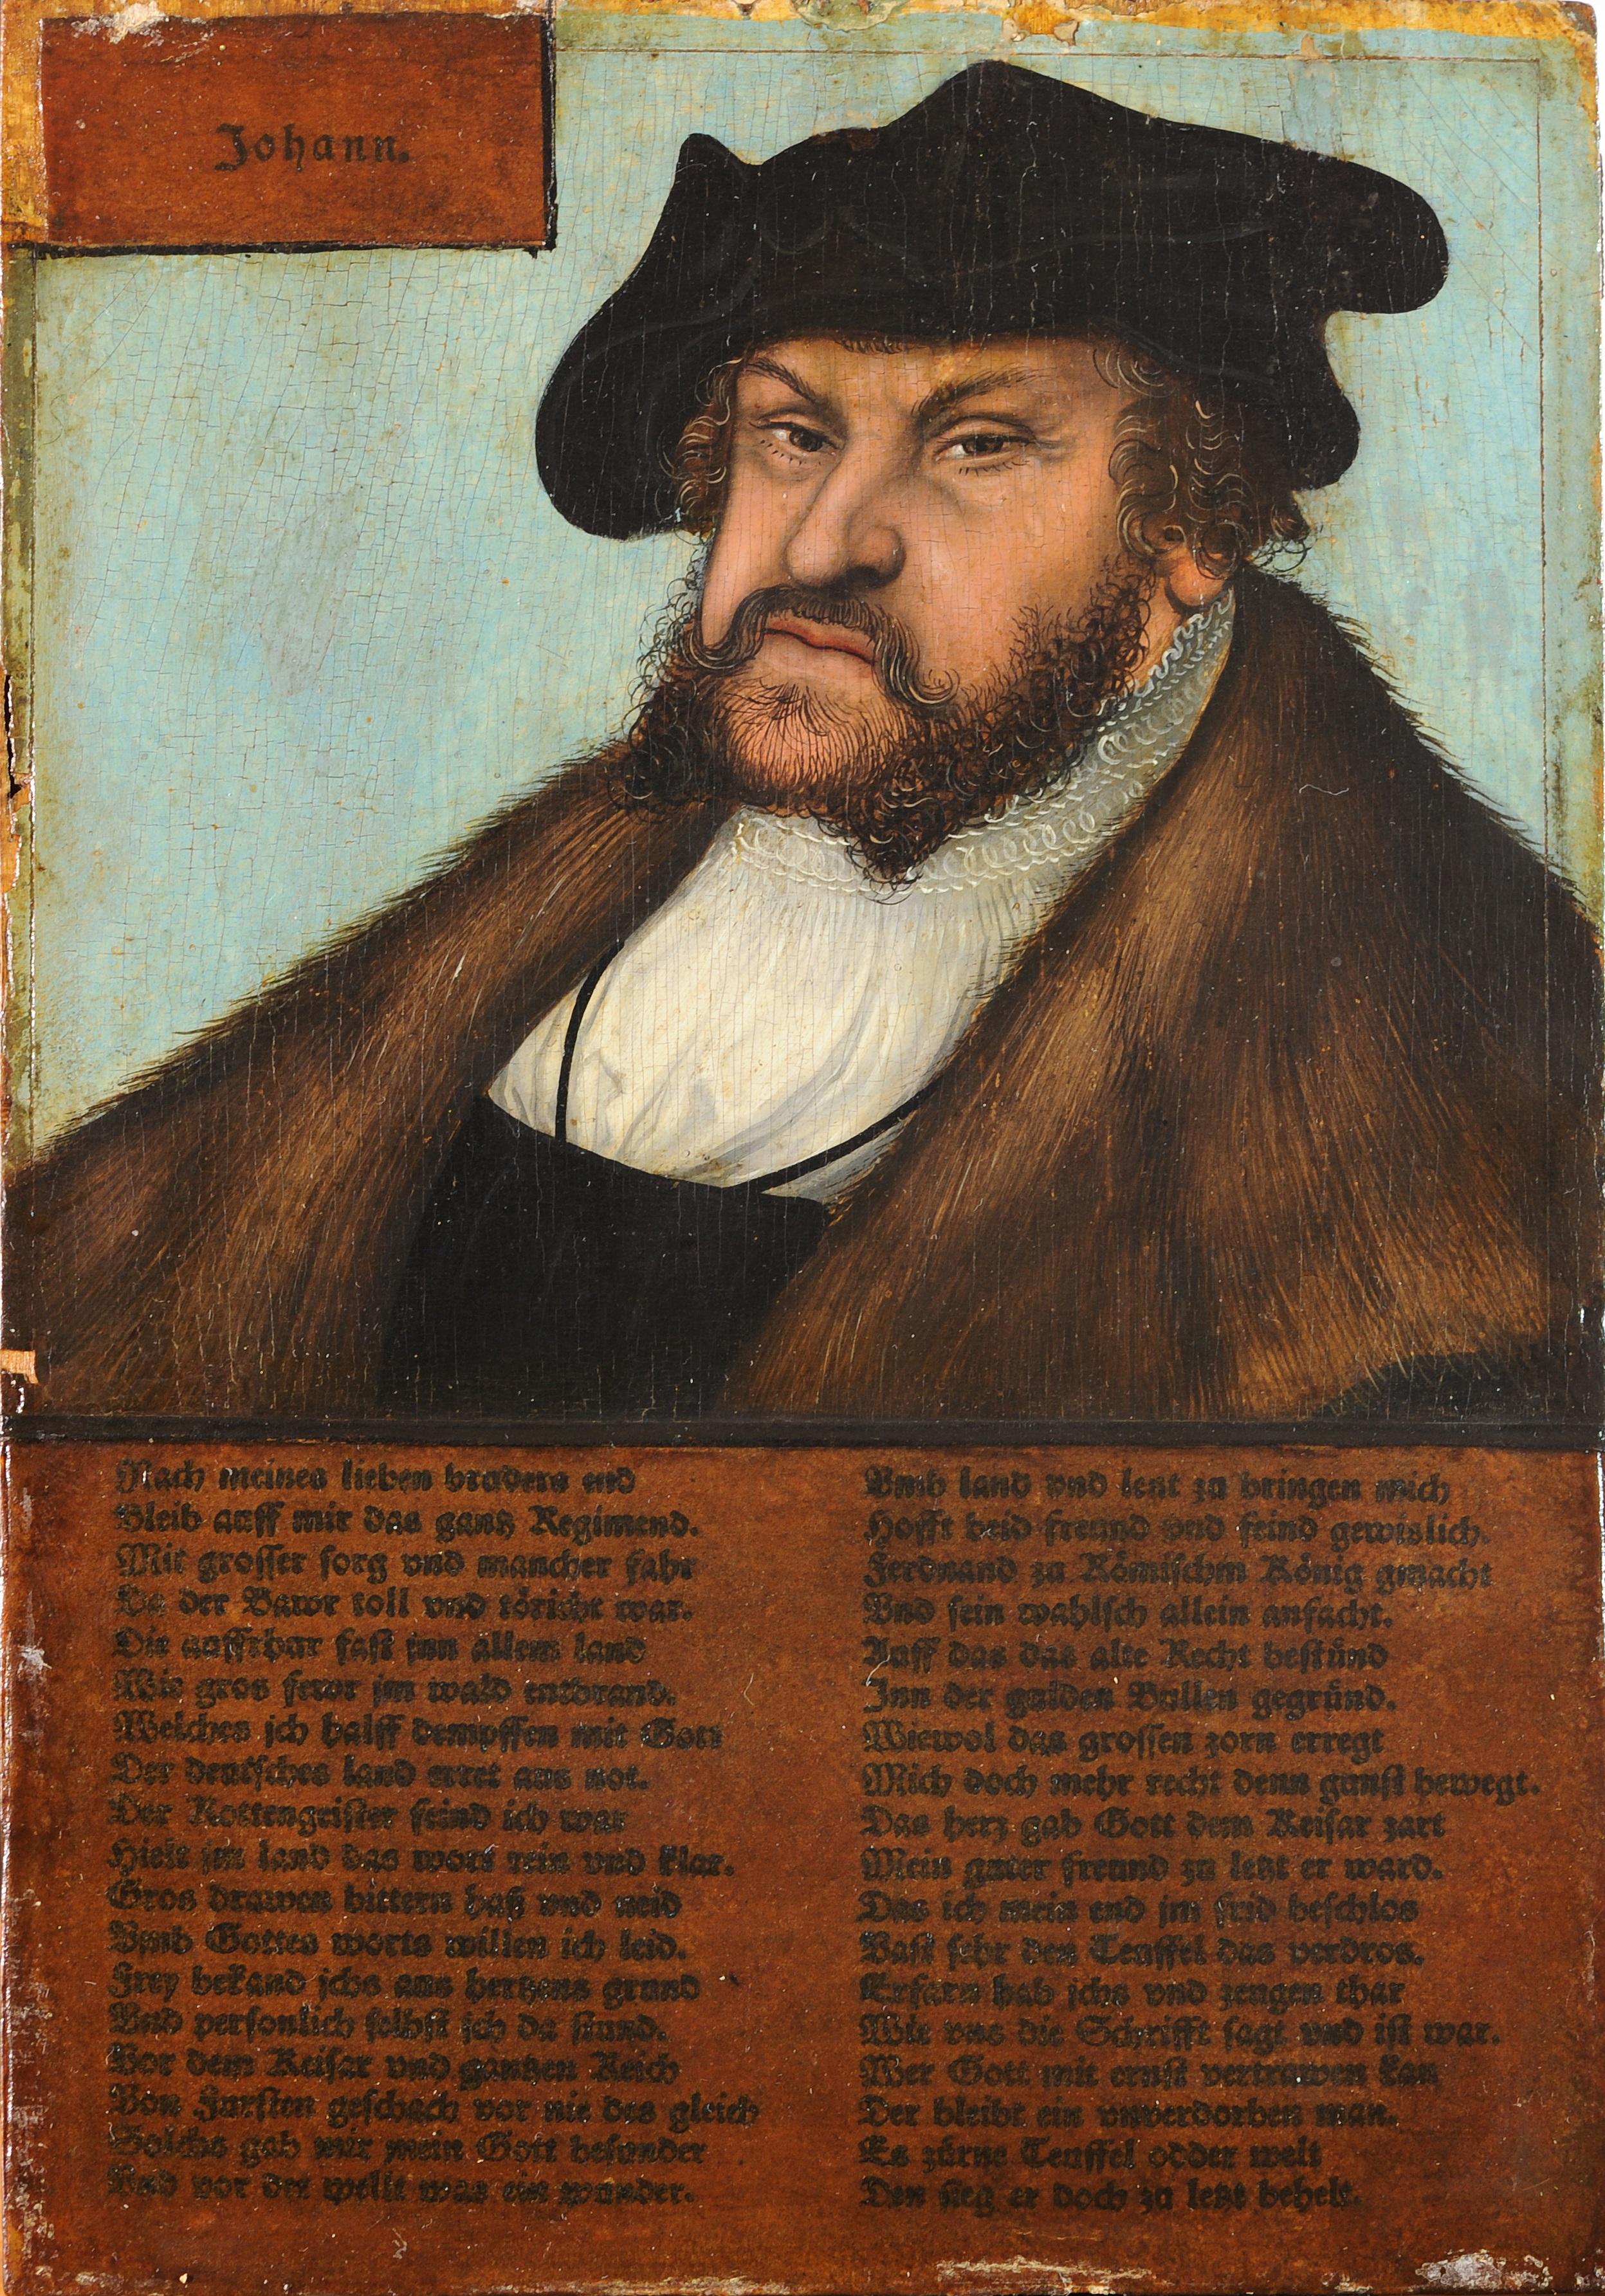 File:Johann-Sachsen-1532-2.jpg